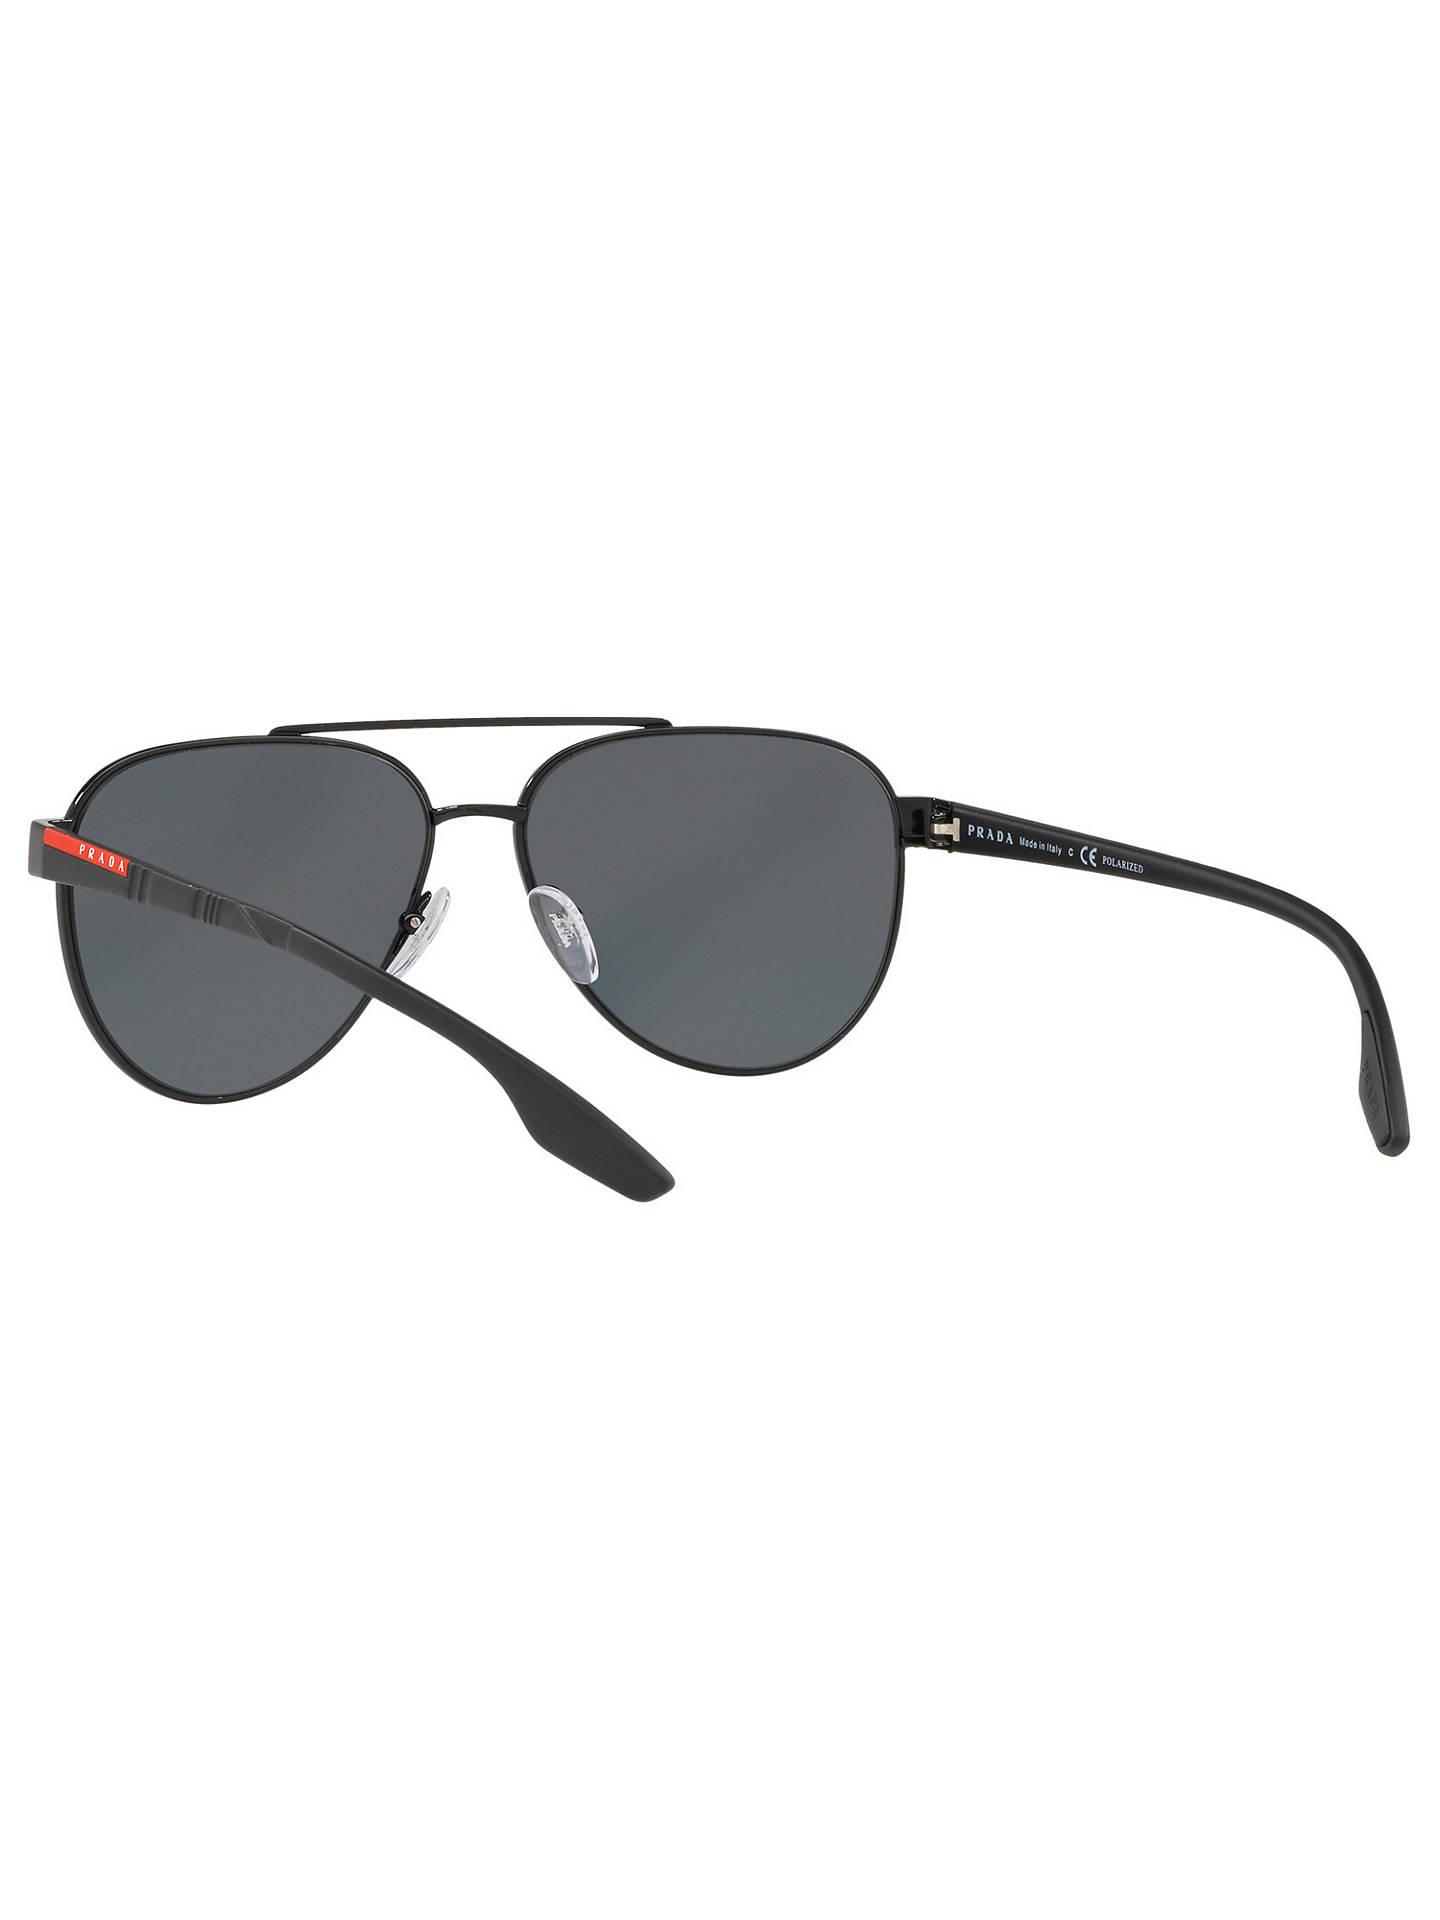 d1a2b7ebd901 Prada Linea Rossa PS 54TS Men s Polarised Aviator Sunglasses at John ...